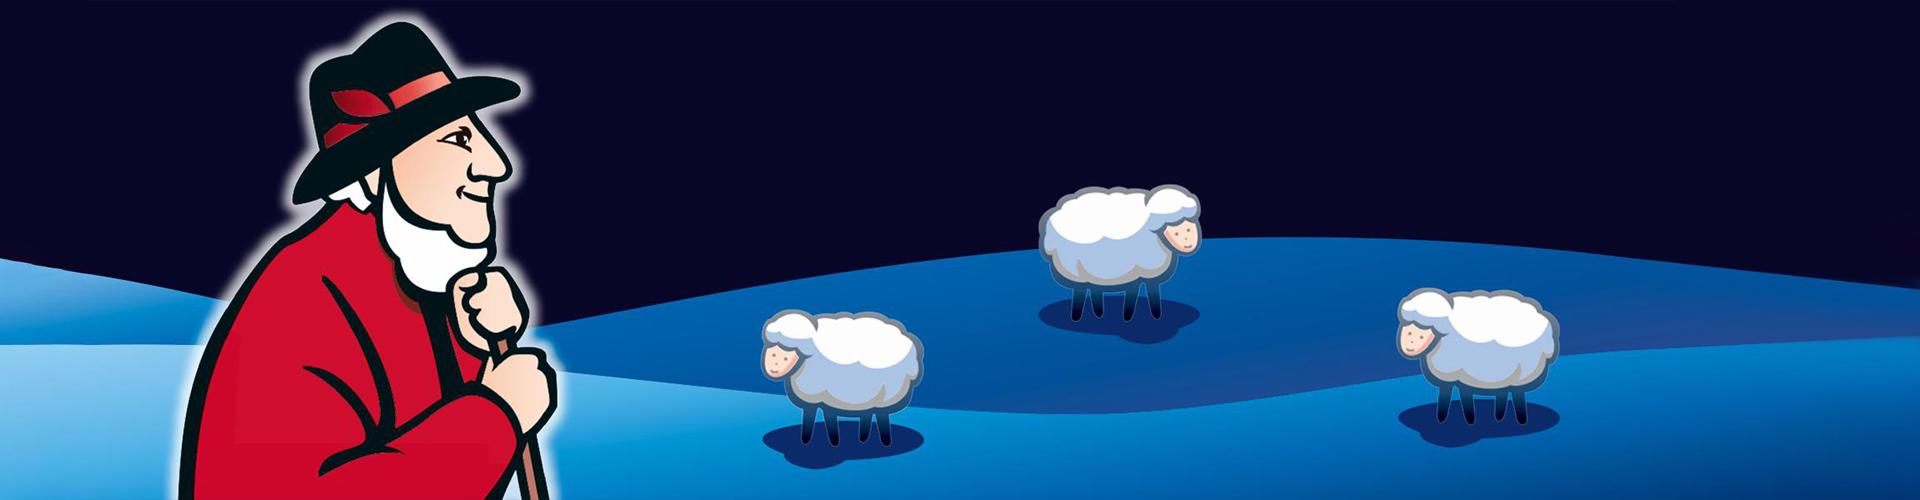 baldriparan ovcak a ovce 1920x600 02